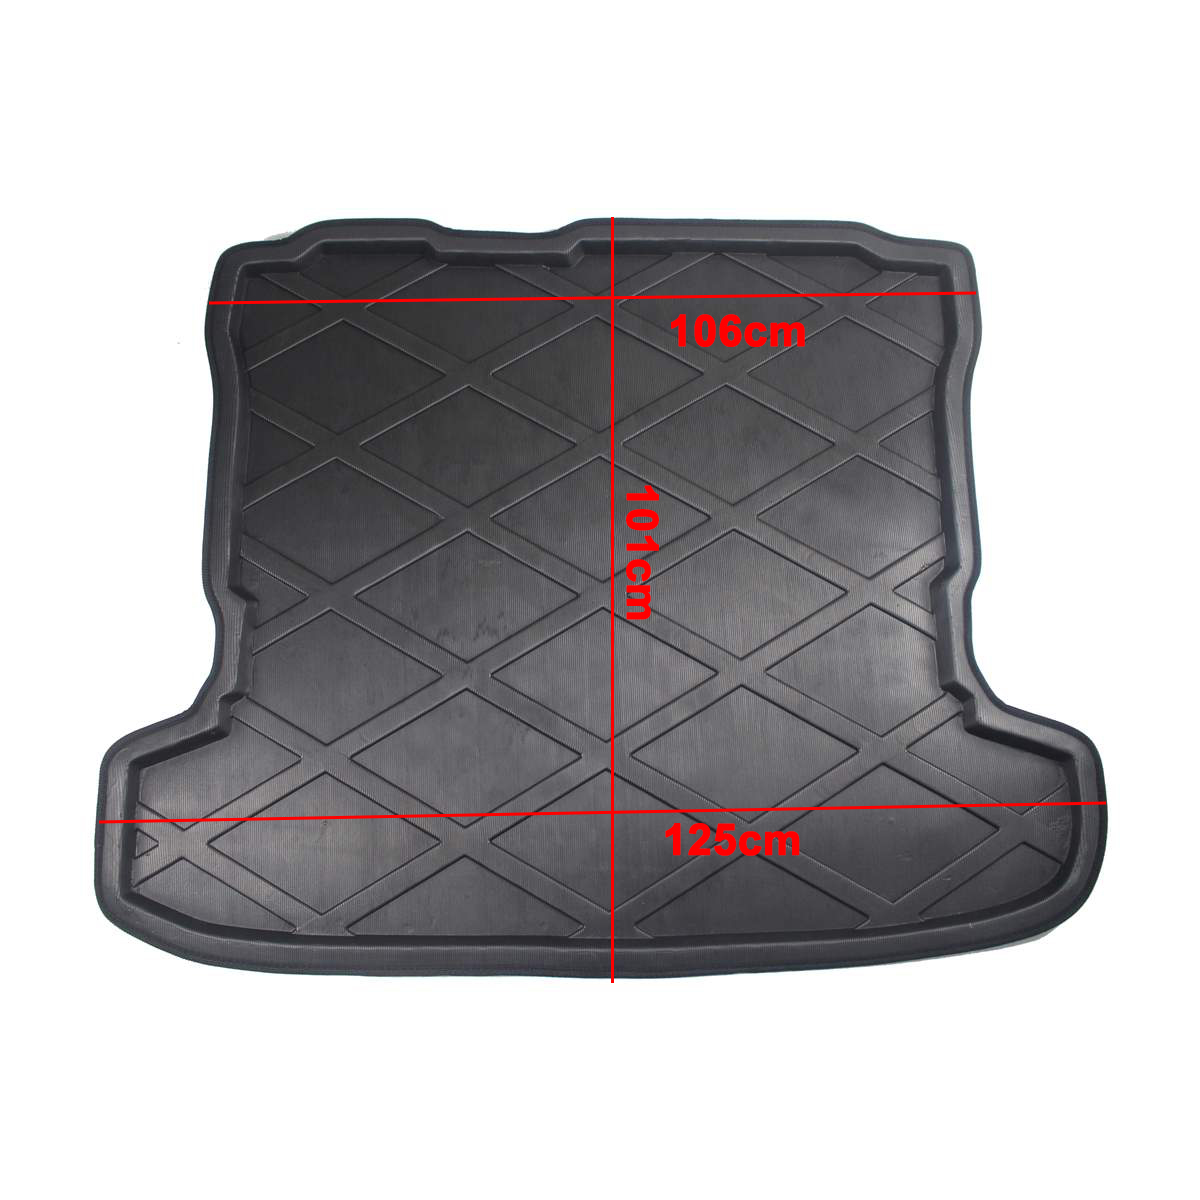 Rear Trunk Cover Carpet For Mitsubishi Pajero V97 Shogun 2007 2008 2009 2010-2018 Cargo Liner Boot Tray Kick Pad Matt Mat Floor